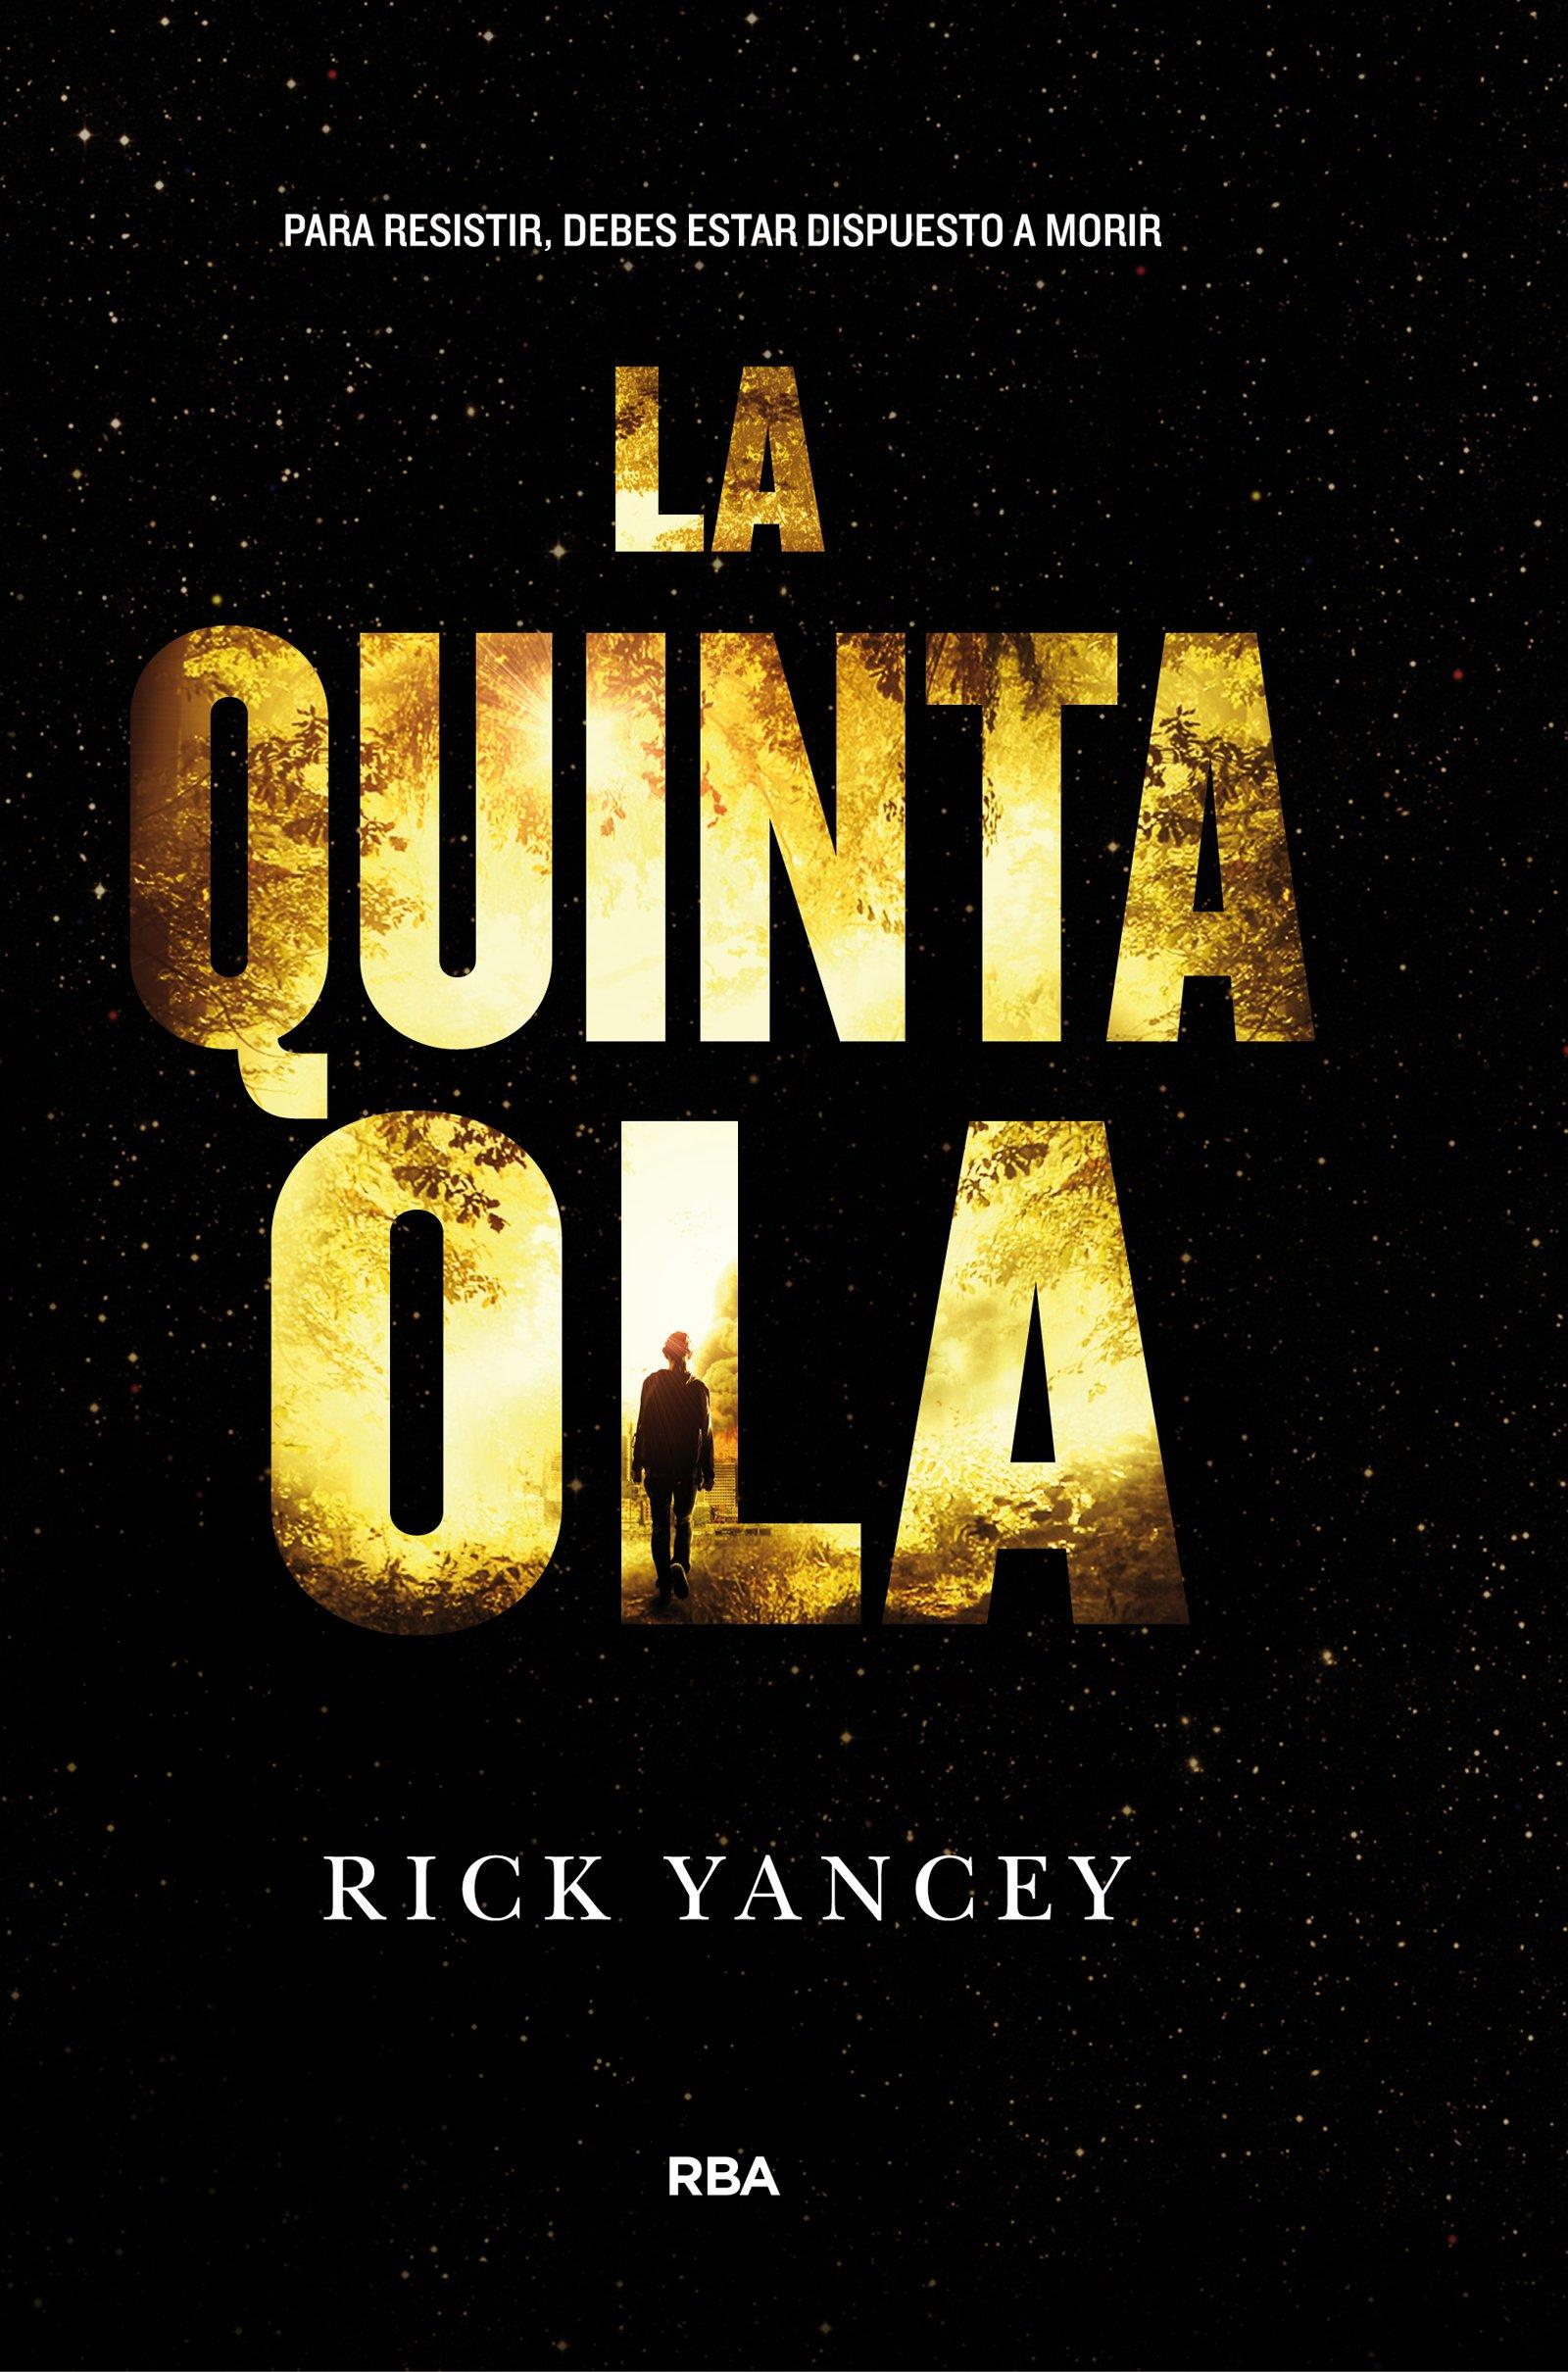 Amazon.com: La Quinta Ola (Spanish Edition) (9788427204225): Rick Yancey, Richard Yancey, Molino-RBA: Books